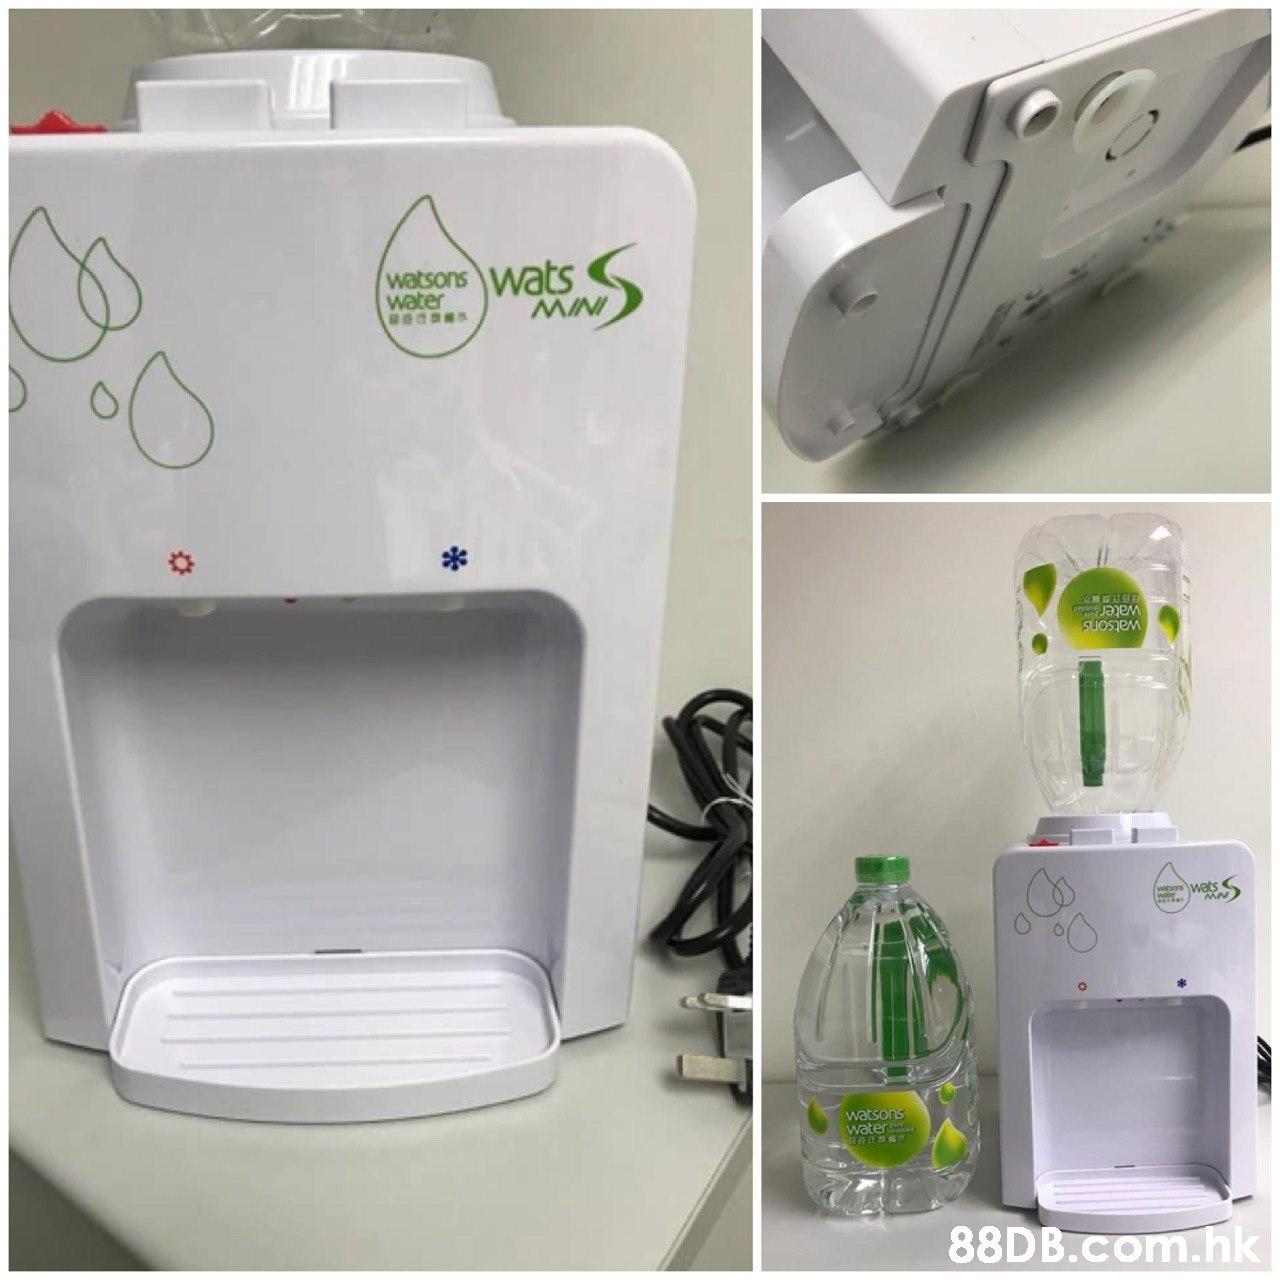 \wats S MINI watsons water water watsons watsons water .hk  Bathroom accessory,Soap dispenser,Urinal,